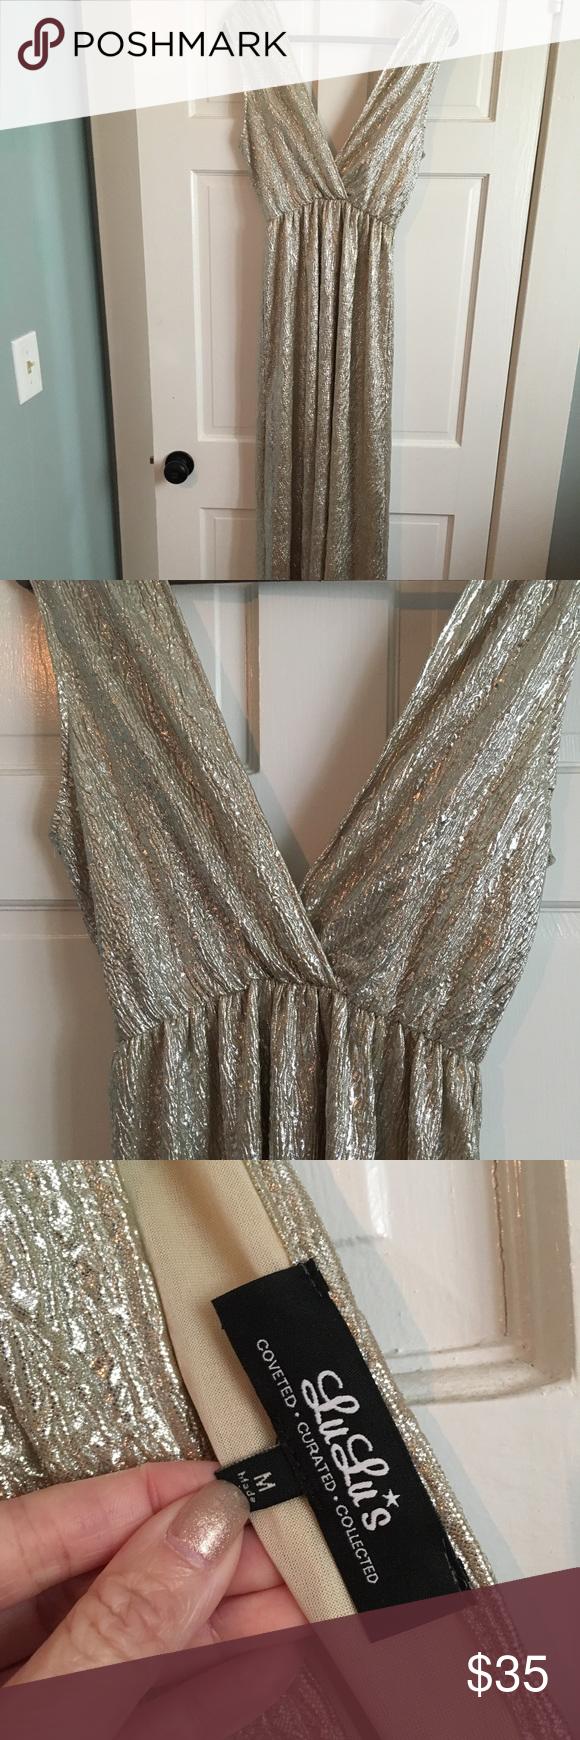 Lulus wedding guest dress  Lulus all that shimmers gold light gold maxi dress  My Posh Picks